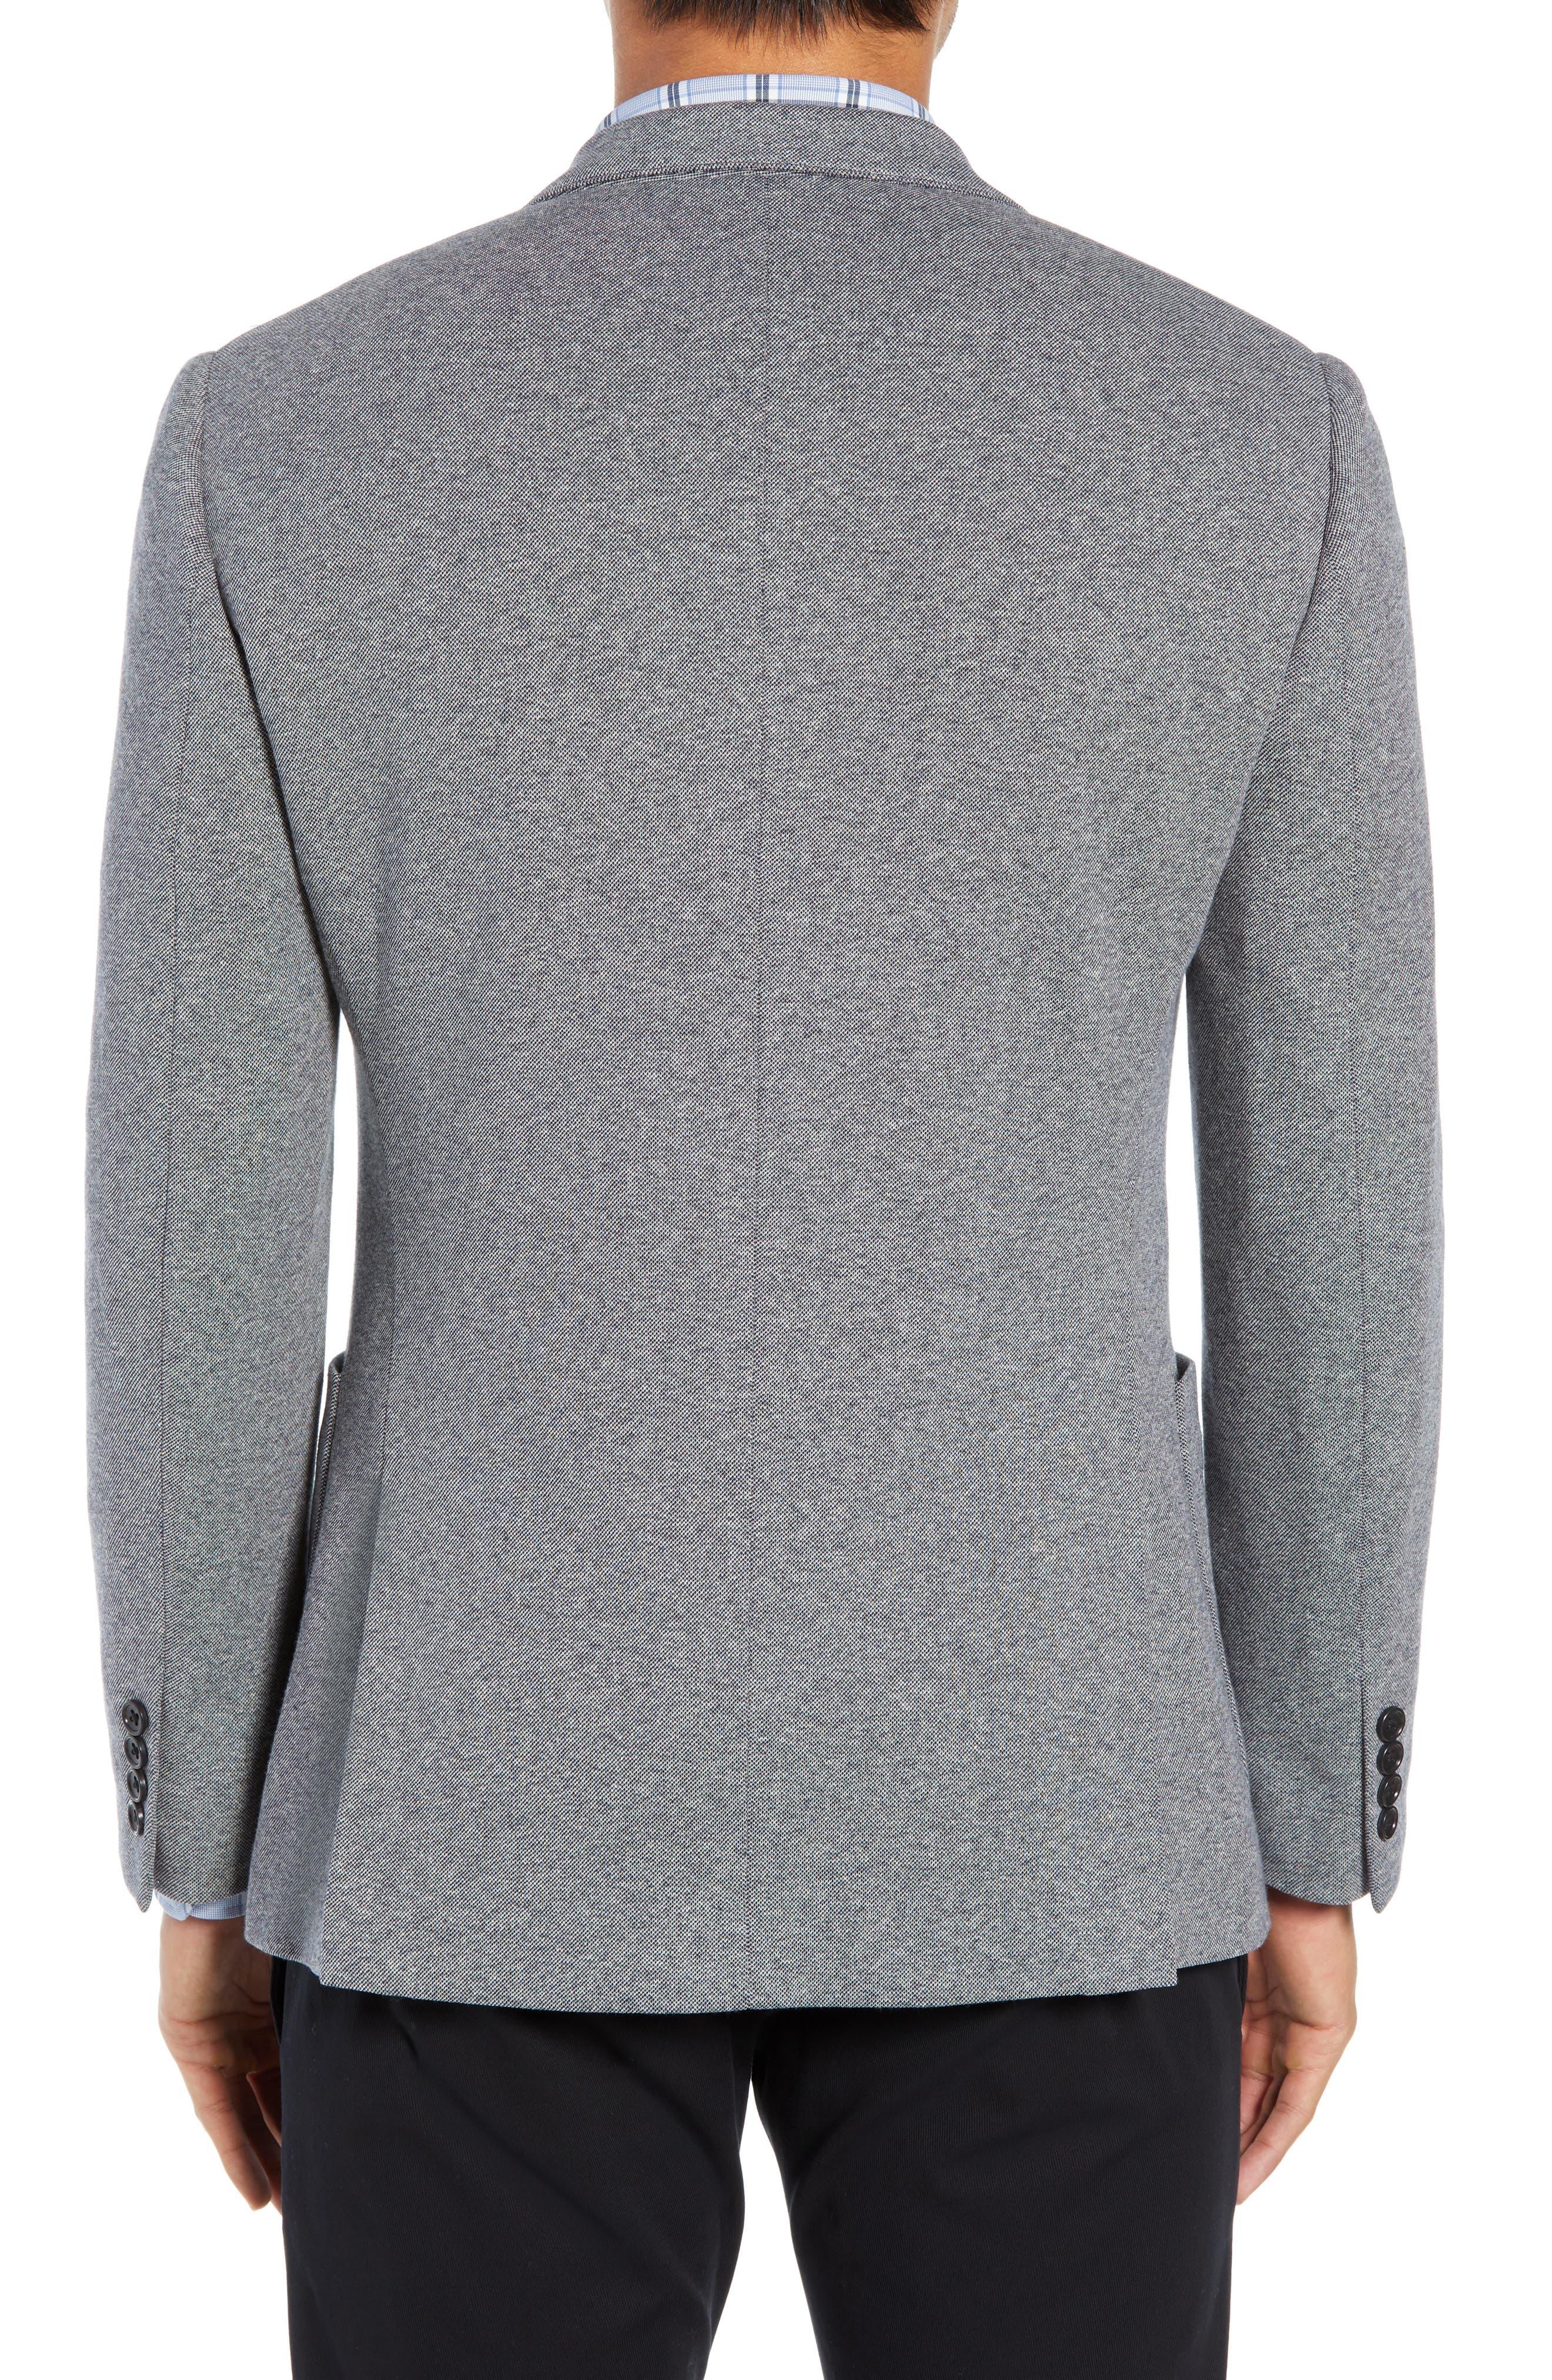 BONOBOS, Jetsetter Slim Fit Knit Cotton Sport Coat, Alternate thumbnail 2, color, LIGHT GREY